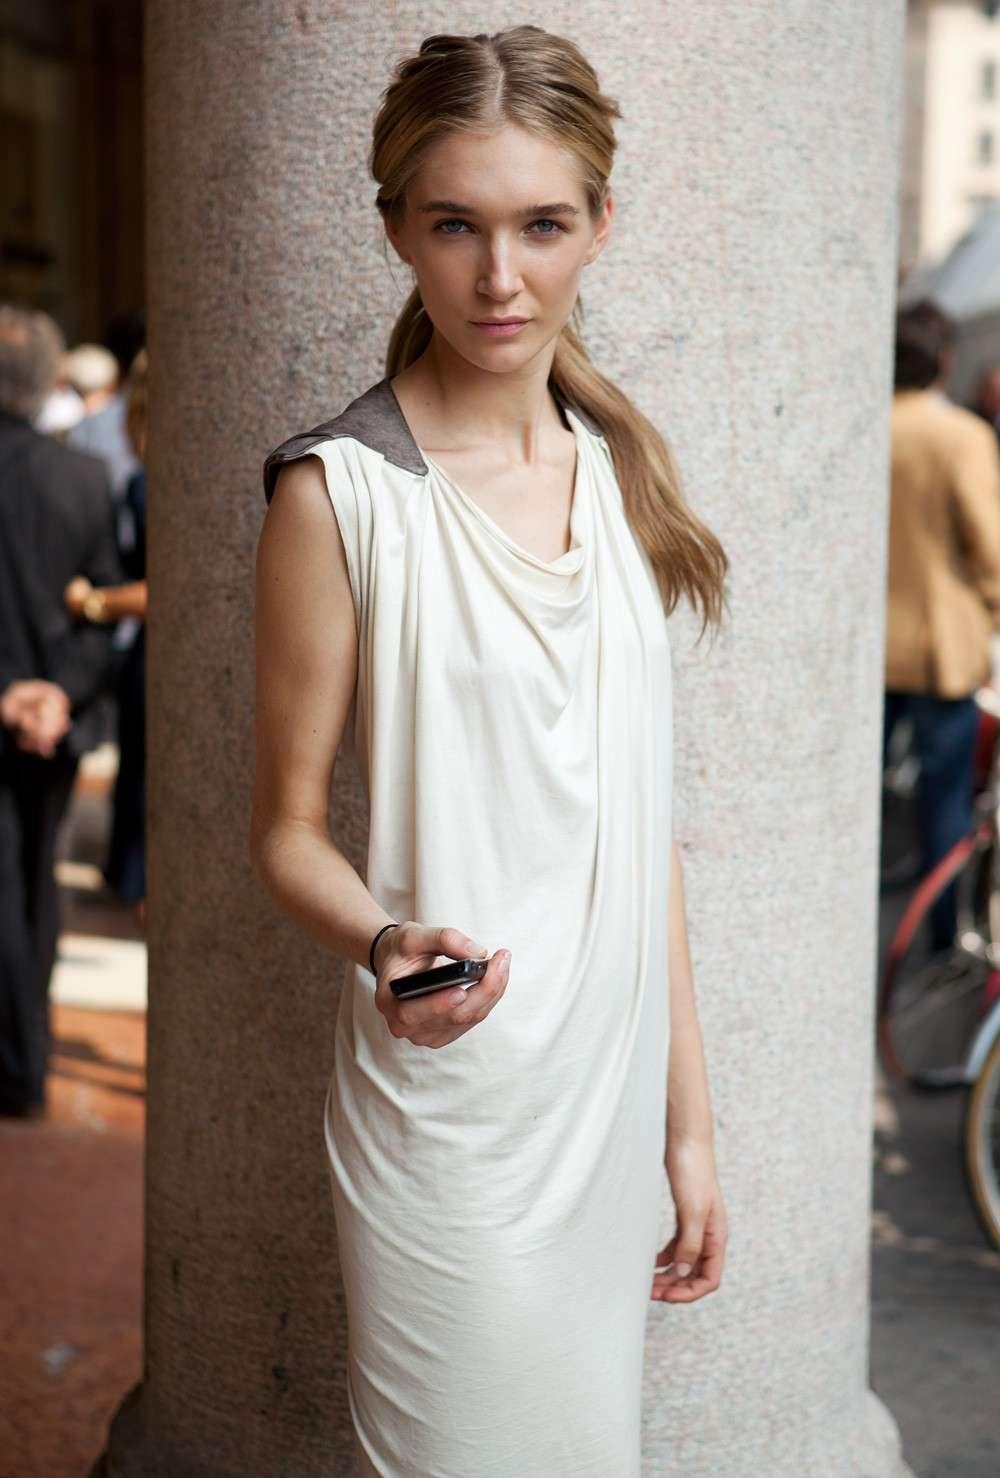 Modella magrissima a Milano